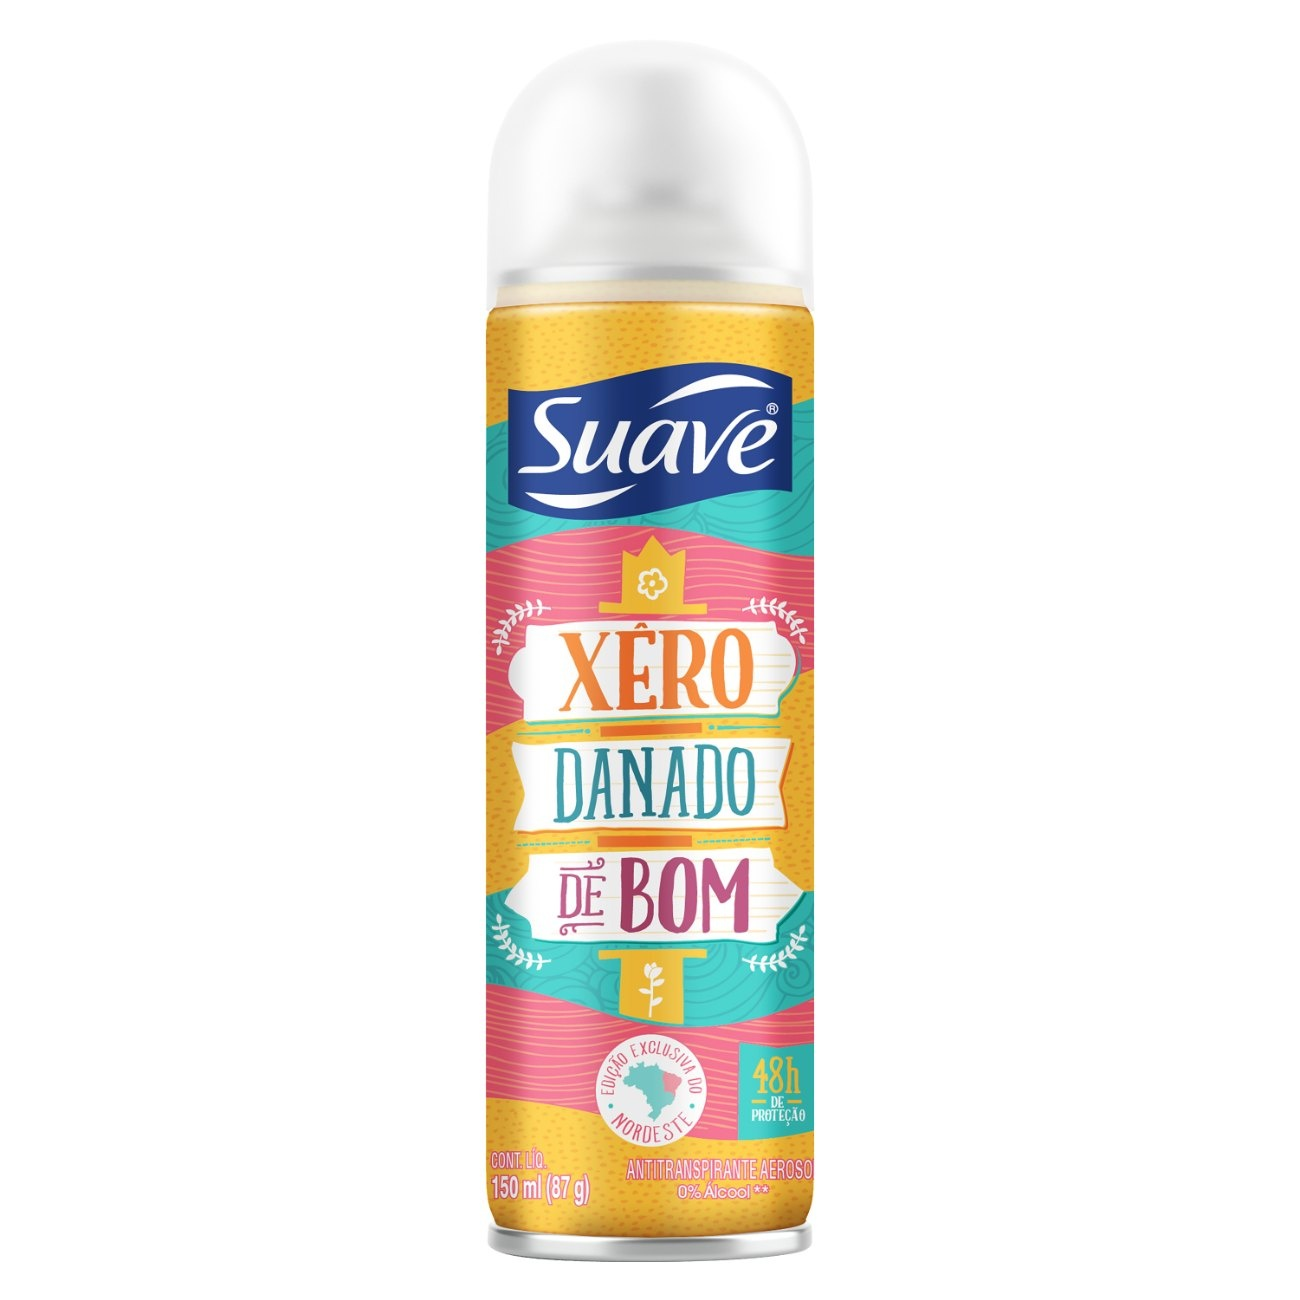 Desodorante Aerossol Antitranspirante Suave Xêro Danado de Bom 150ml